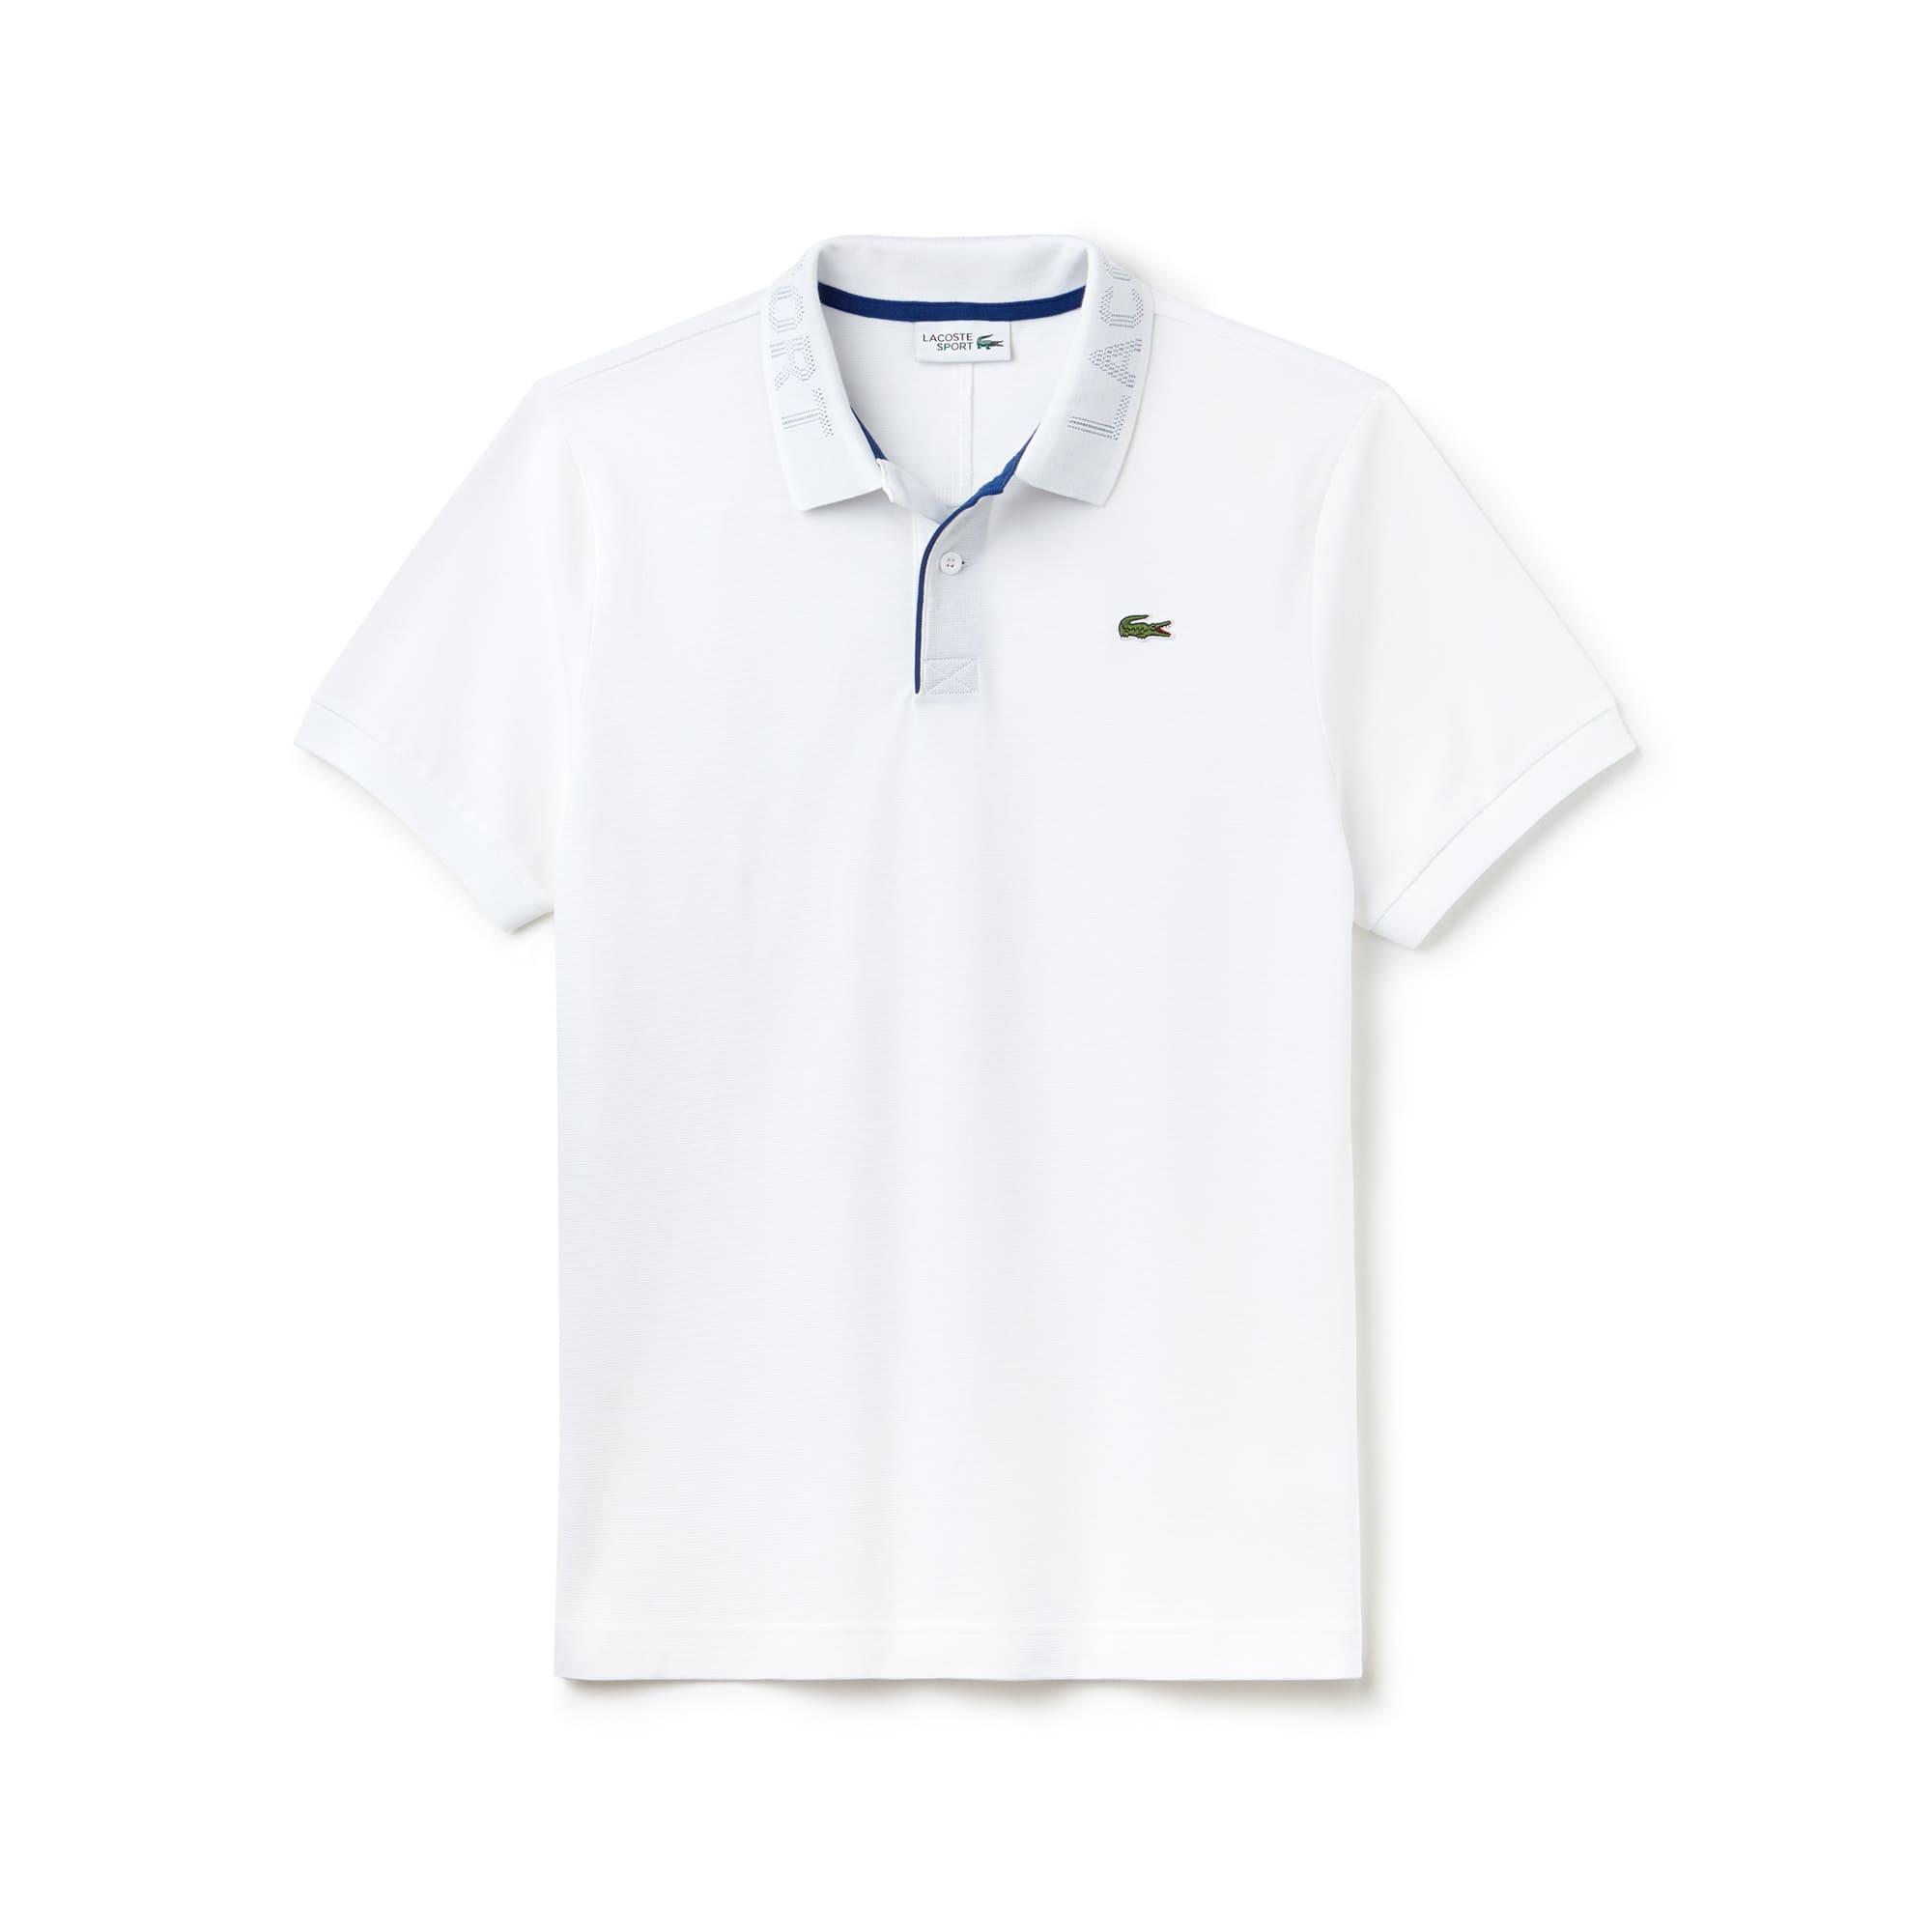 Men's Lacoste SPORT Print Collar Ultra-Light Cotton Tennis Polo